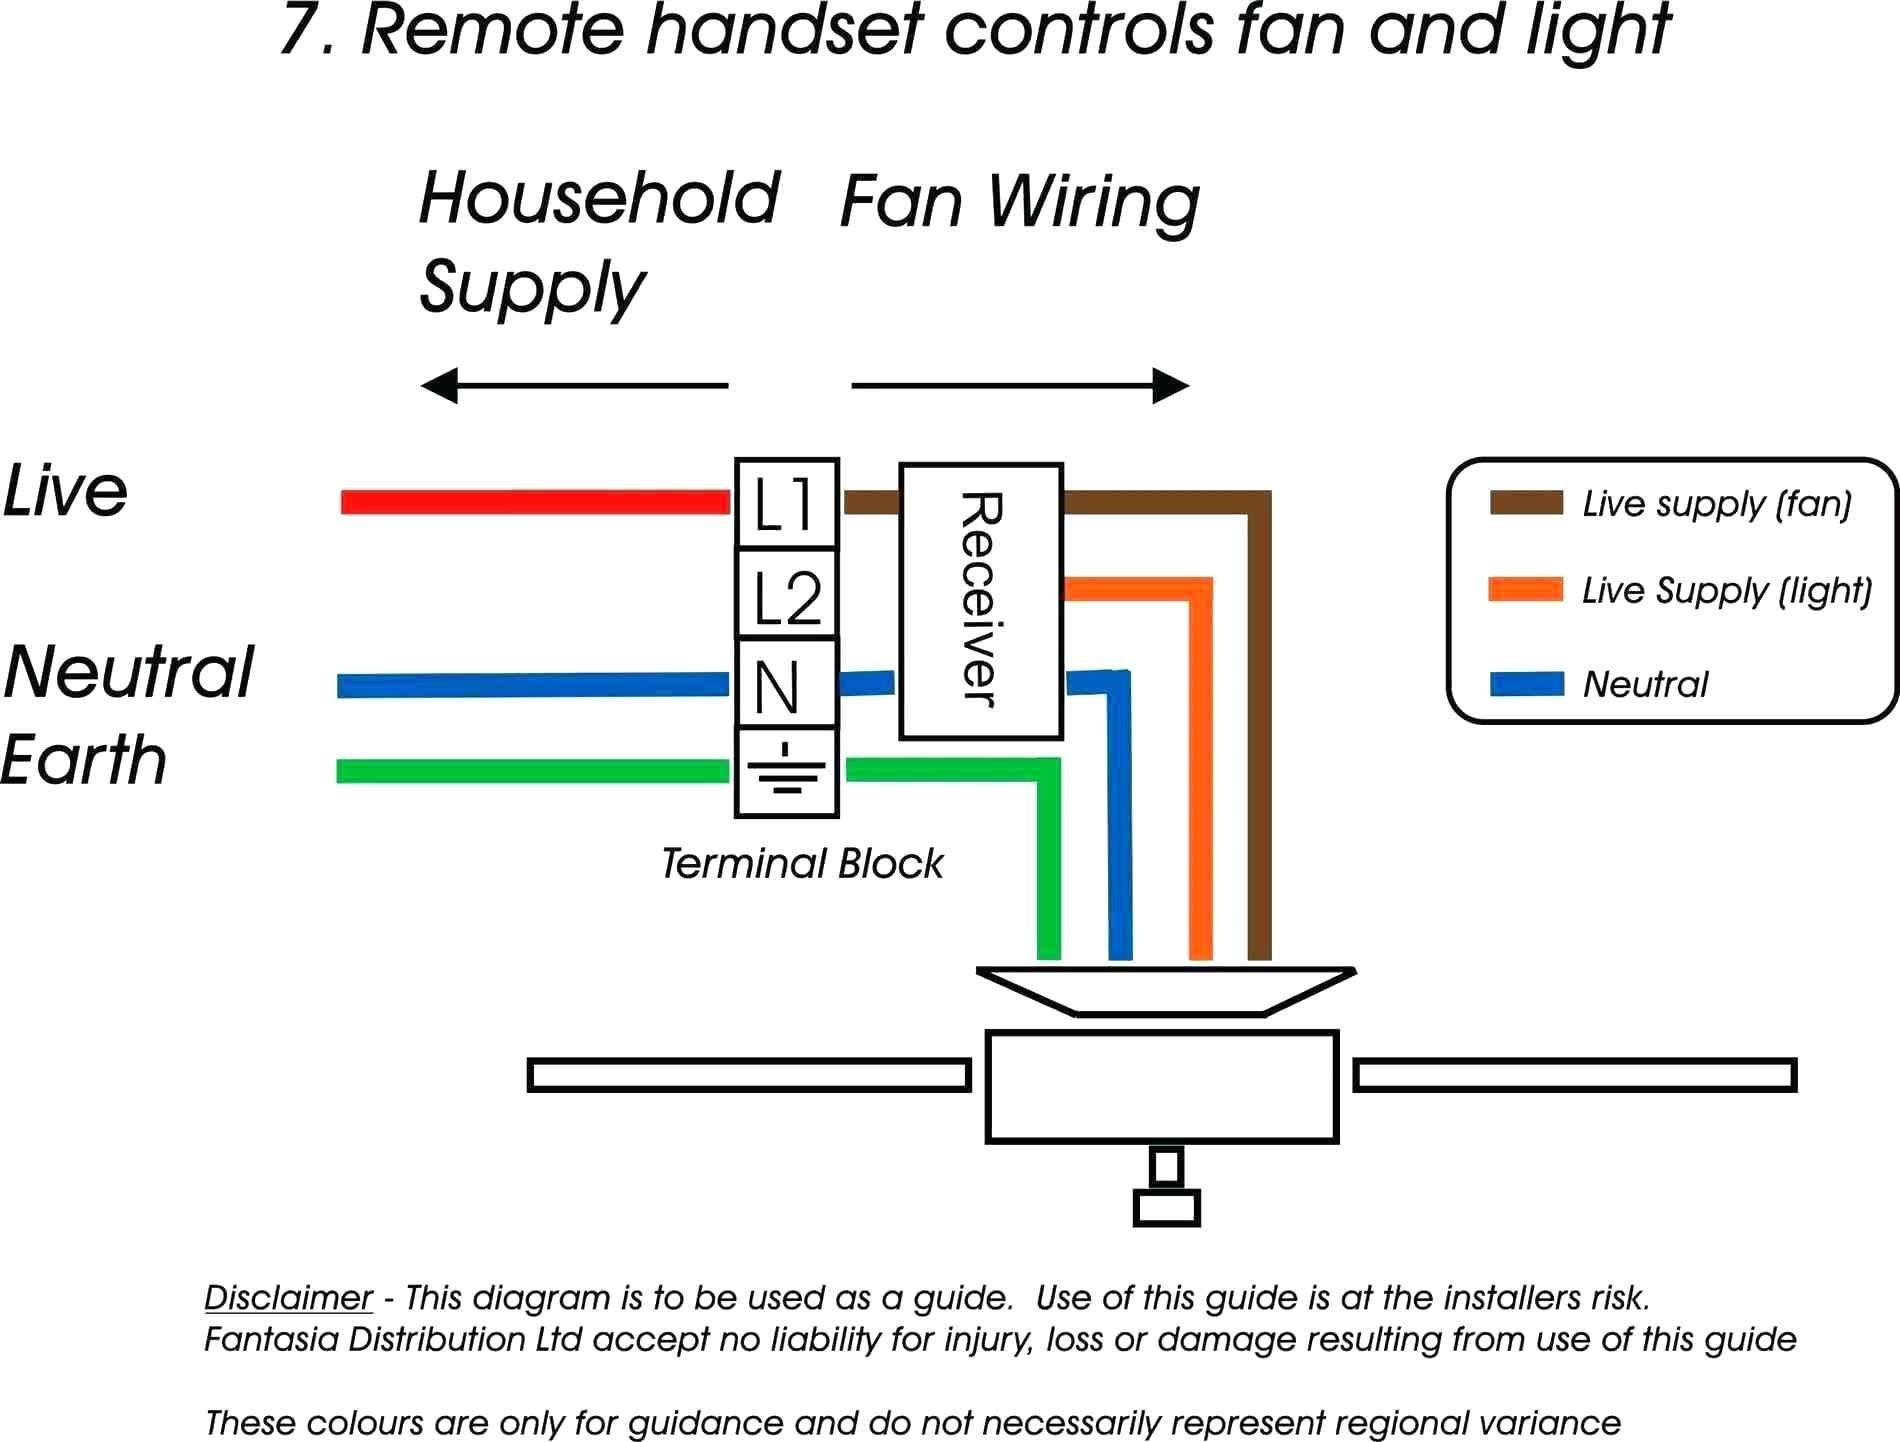 277 volt wiring diagram elegant best 277 volt lighting wiring diagram of 277 volt wiring diagram 277 volt wiring diagram wiring diagram image